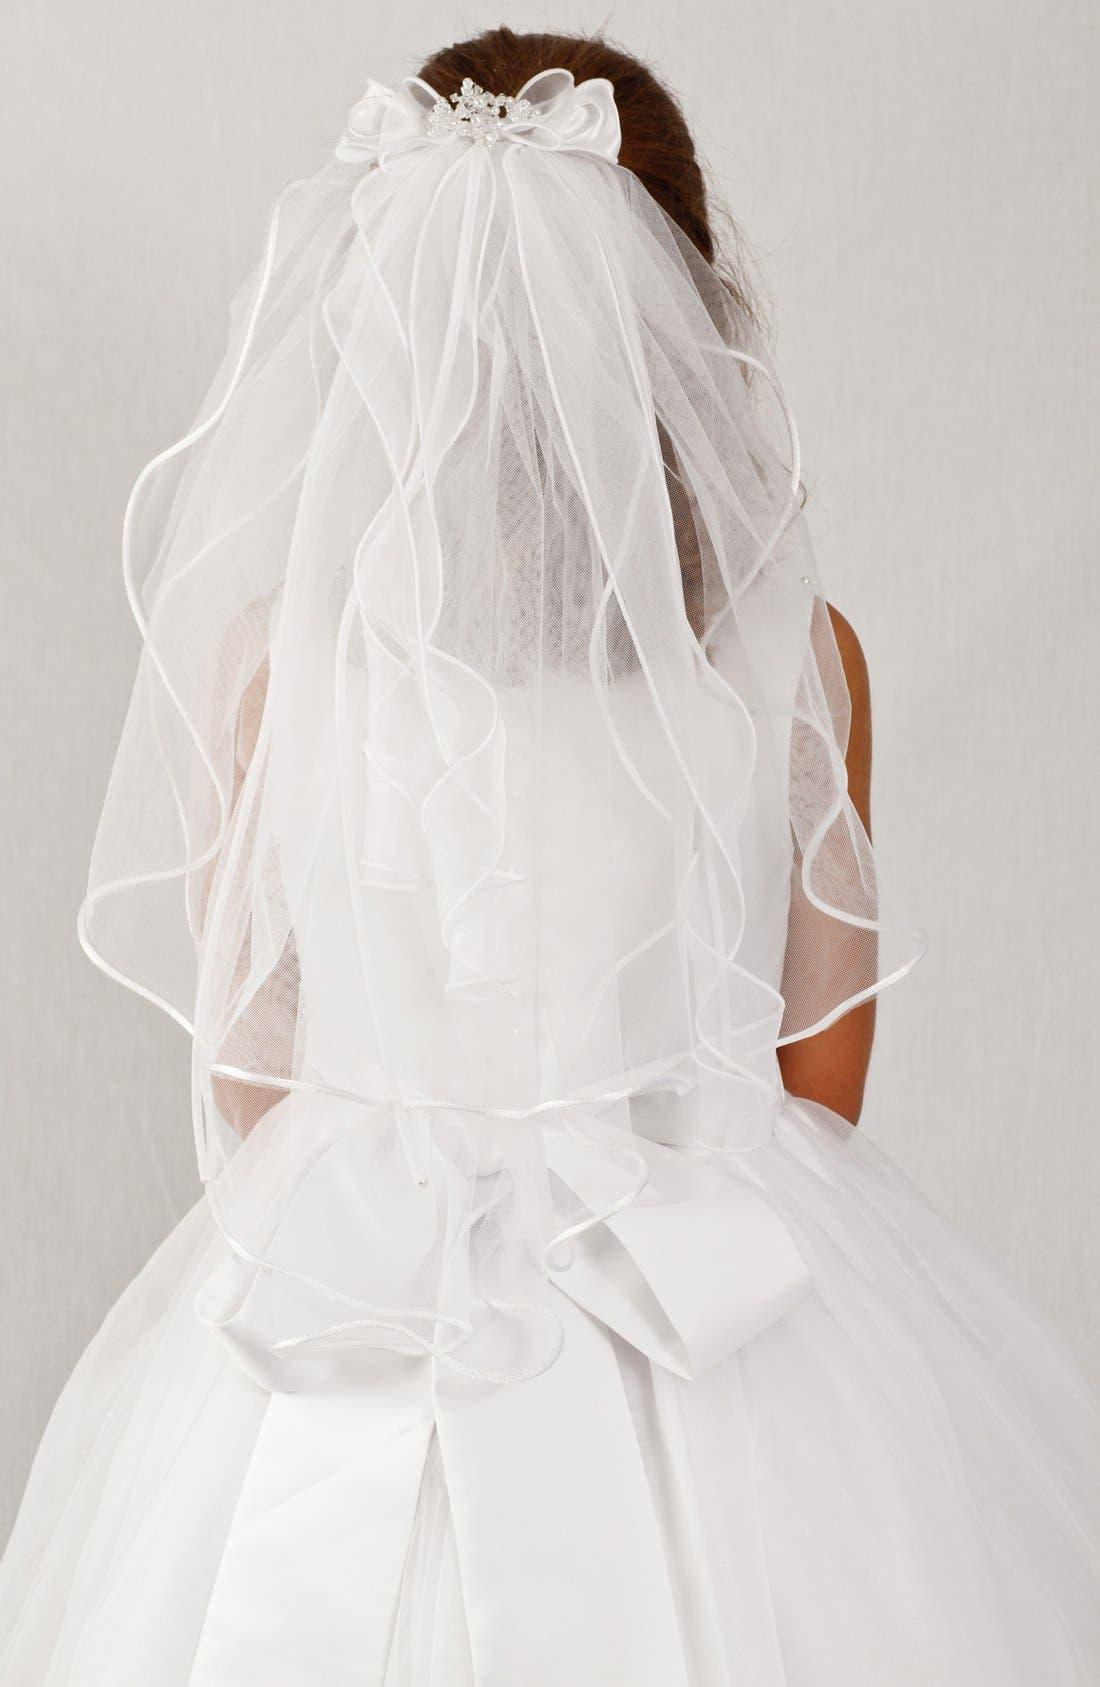 Alternate Image 1 Selected - Lauren Marie Organza Bow Veil (Girls)